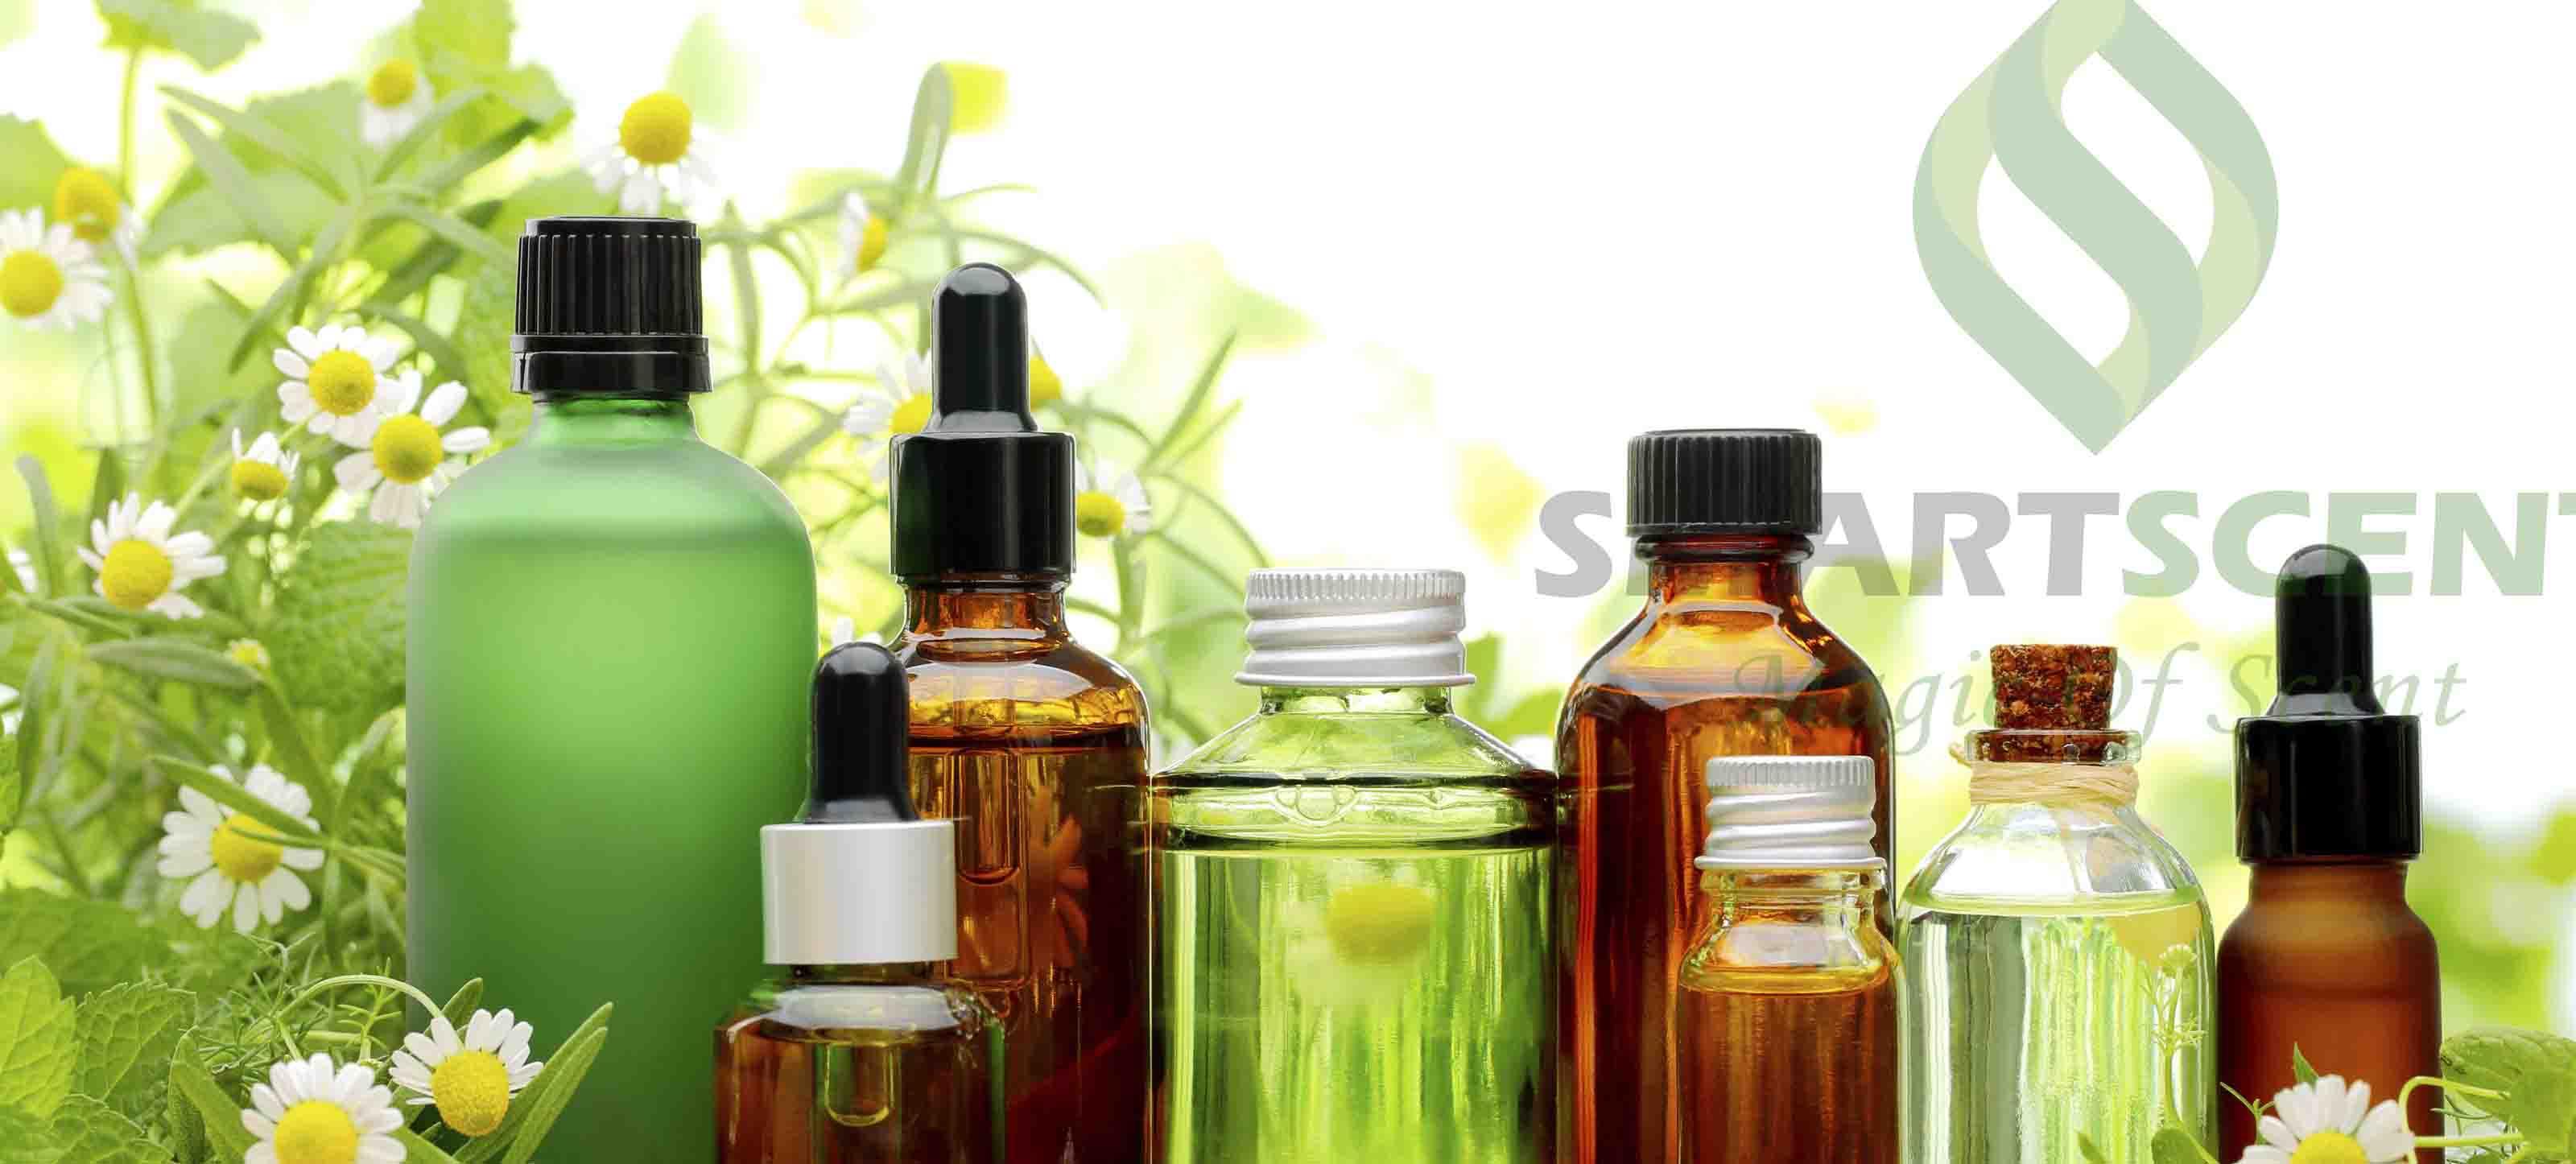 Tinh dầu nguyên chất SmartScent